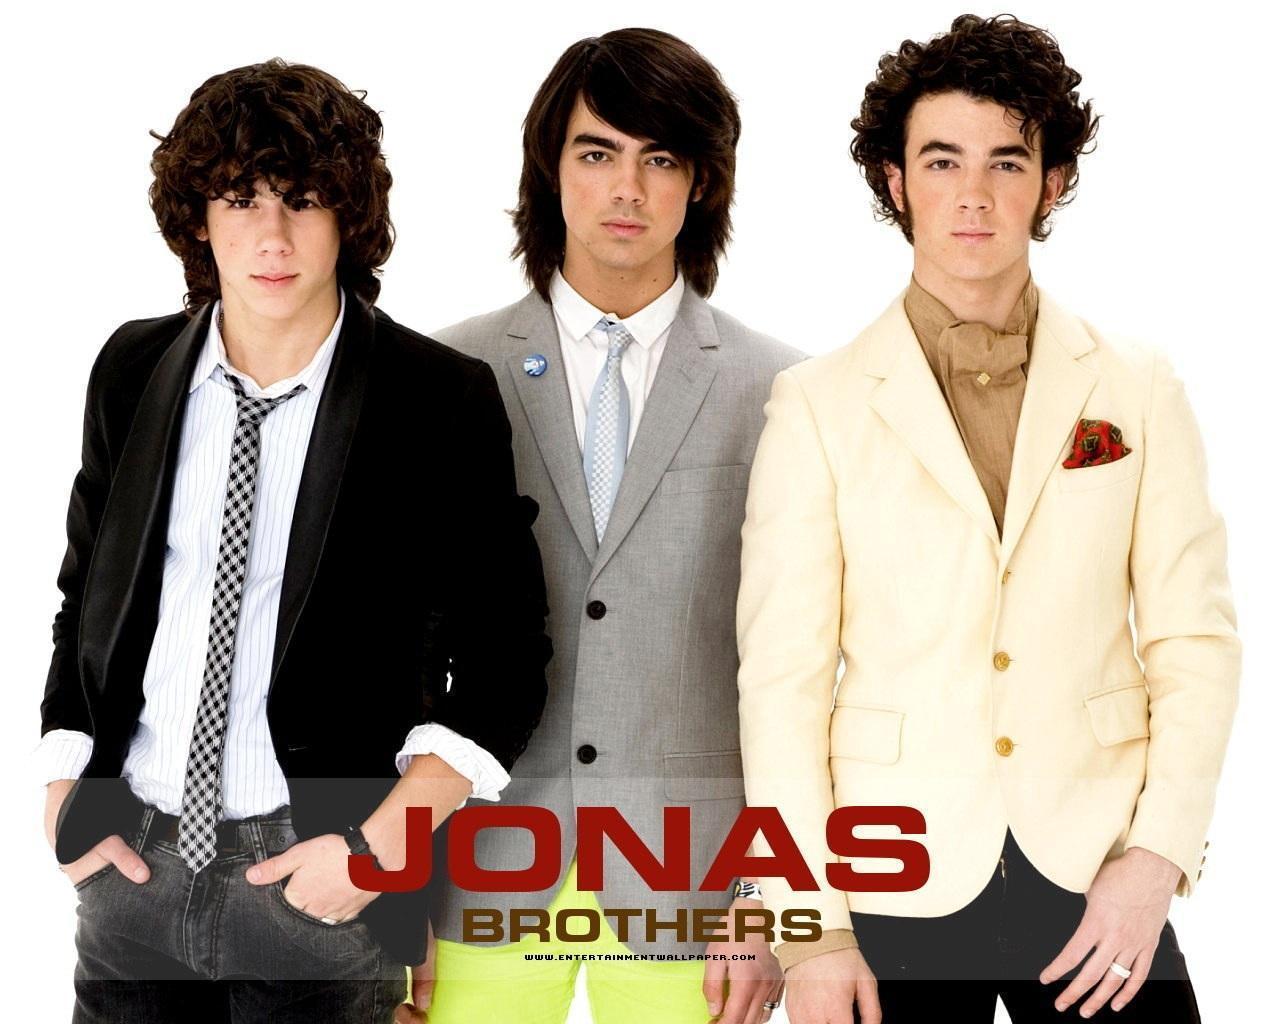 NSYNC, Backstreet Boys, Linkin Park, Jonas Brothers, Band of Boys, Spice Girls, Viva Girls, Aerosmith, Vengaboys